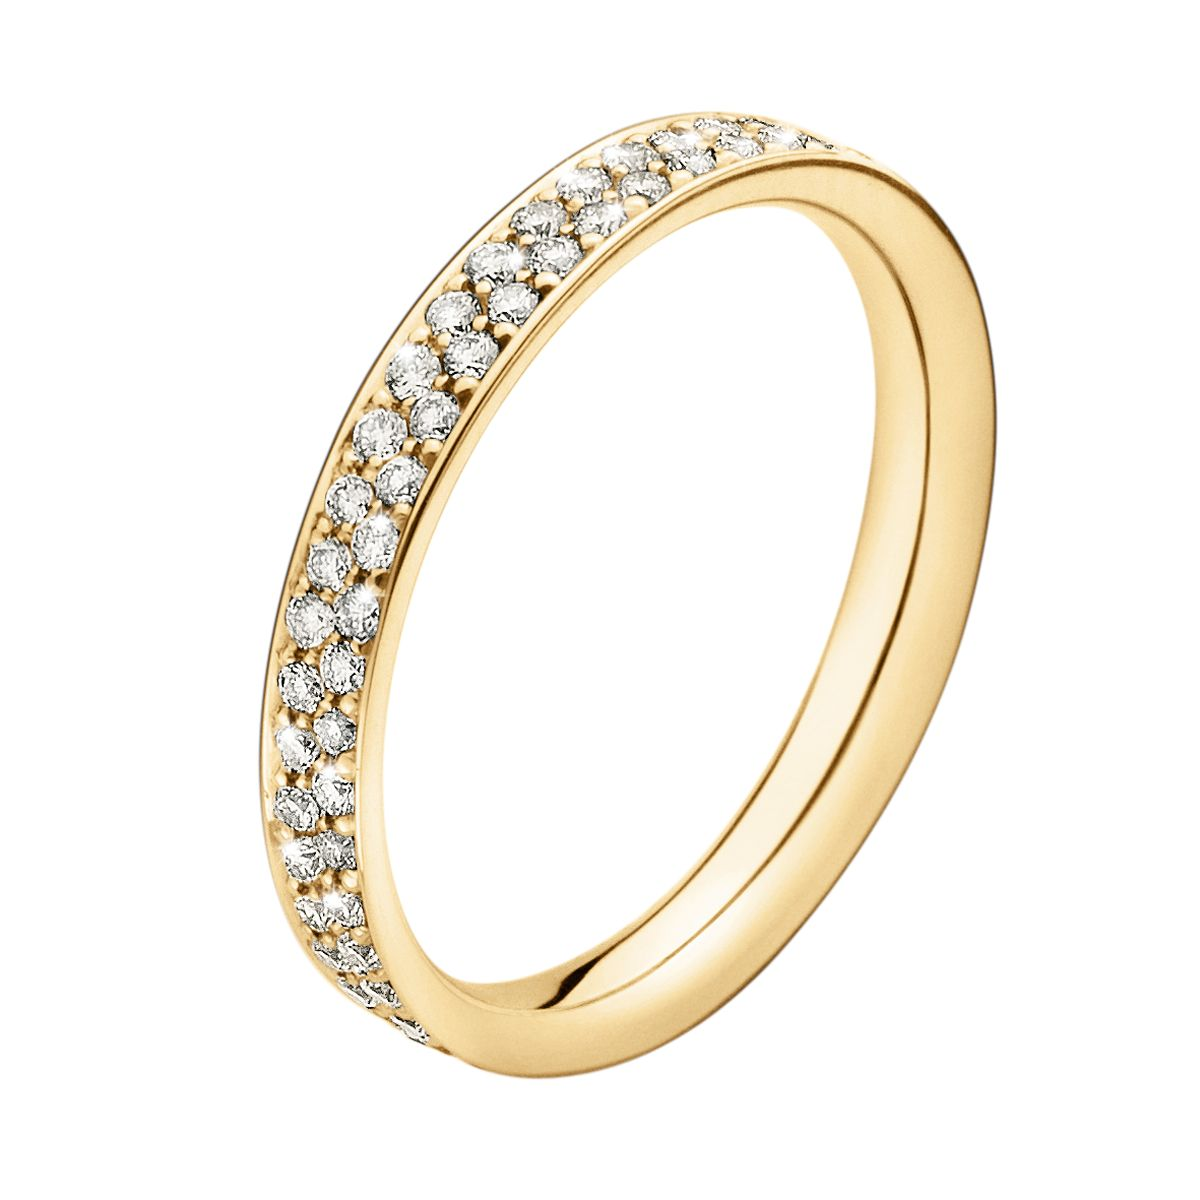 Georg Jensen Magic Ring - 18 kt. guld med pavéfattede brillianter - min  drømme vielsesring a9cd2caeb92fe